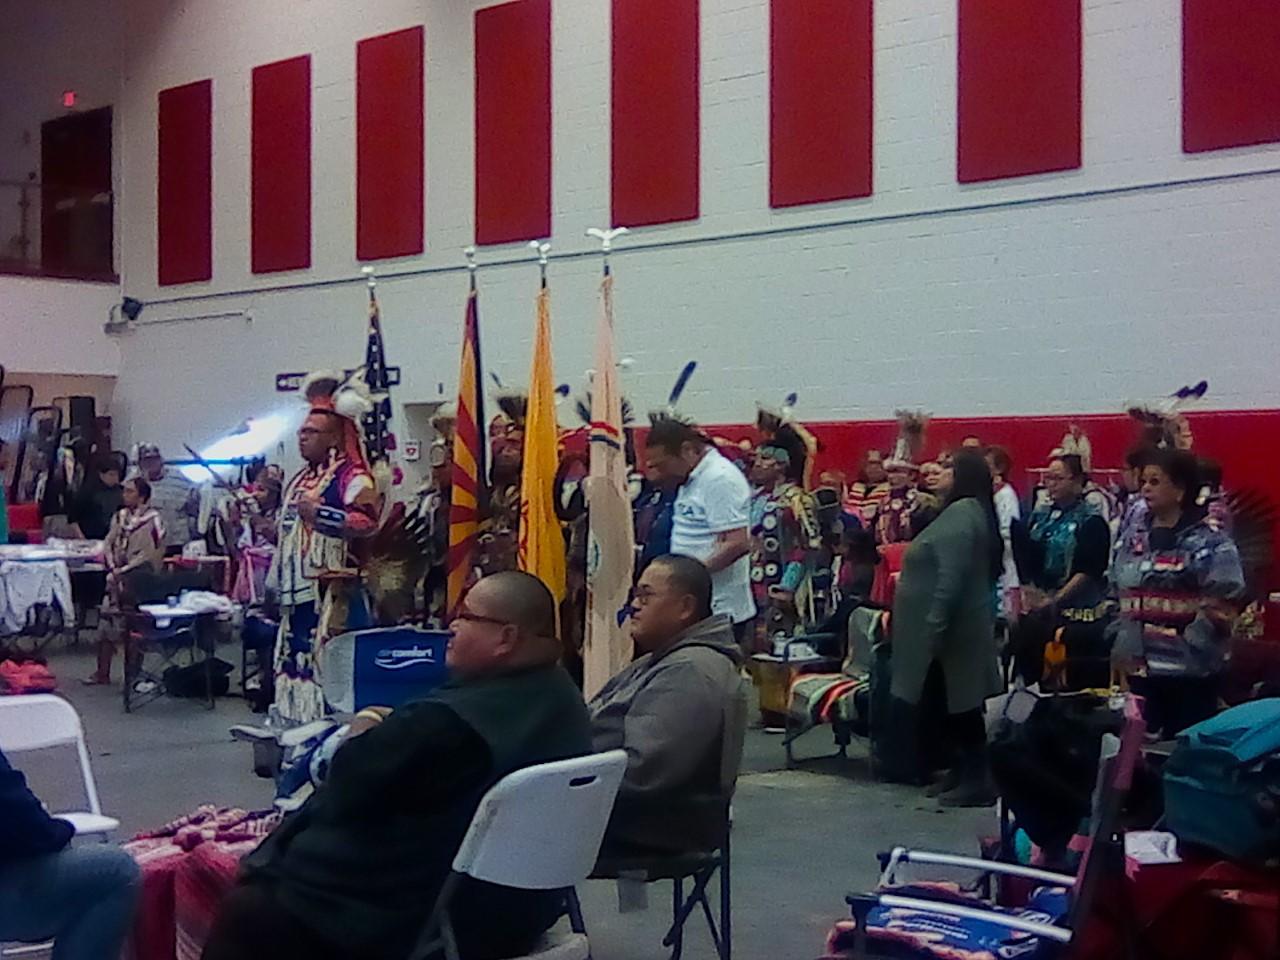 NTU Skyhawk First Nations Student Organization Hosts Annual Powwow for Graduating Class of 2019